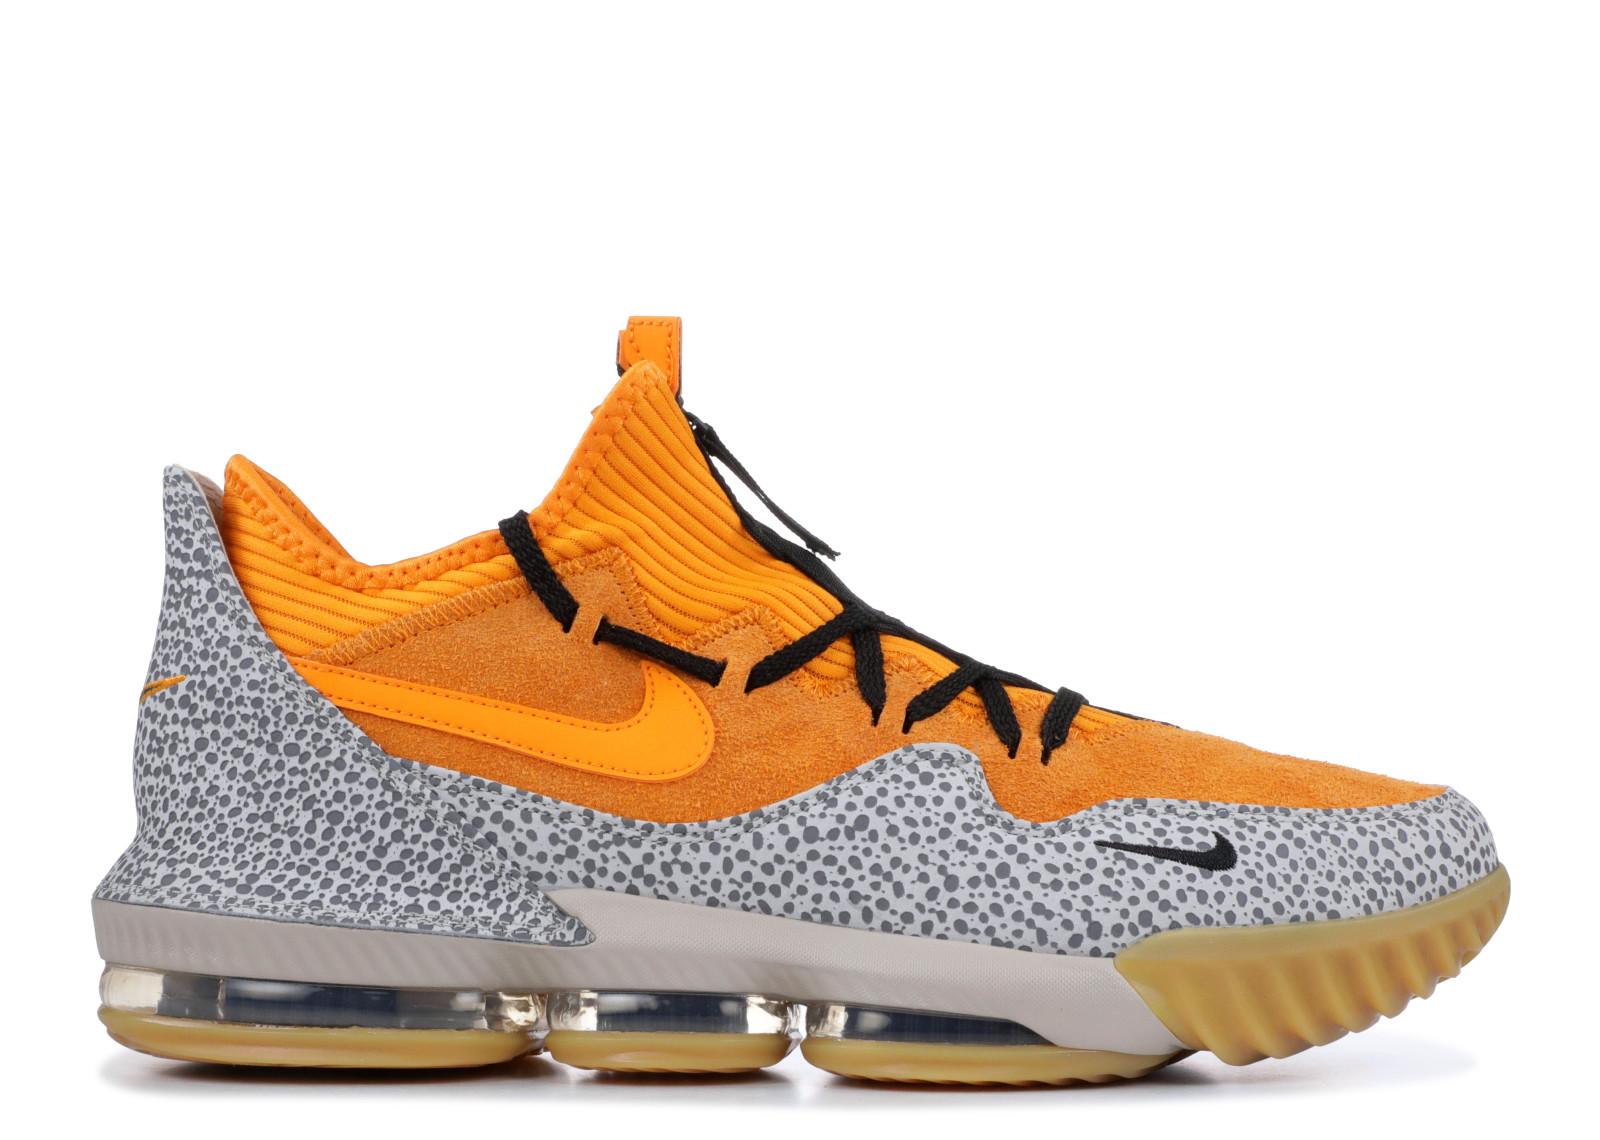 7994159486c1 Kick Avenue - Authentic Sneakers